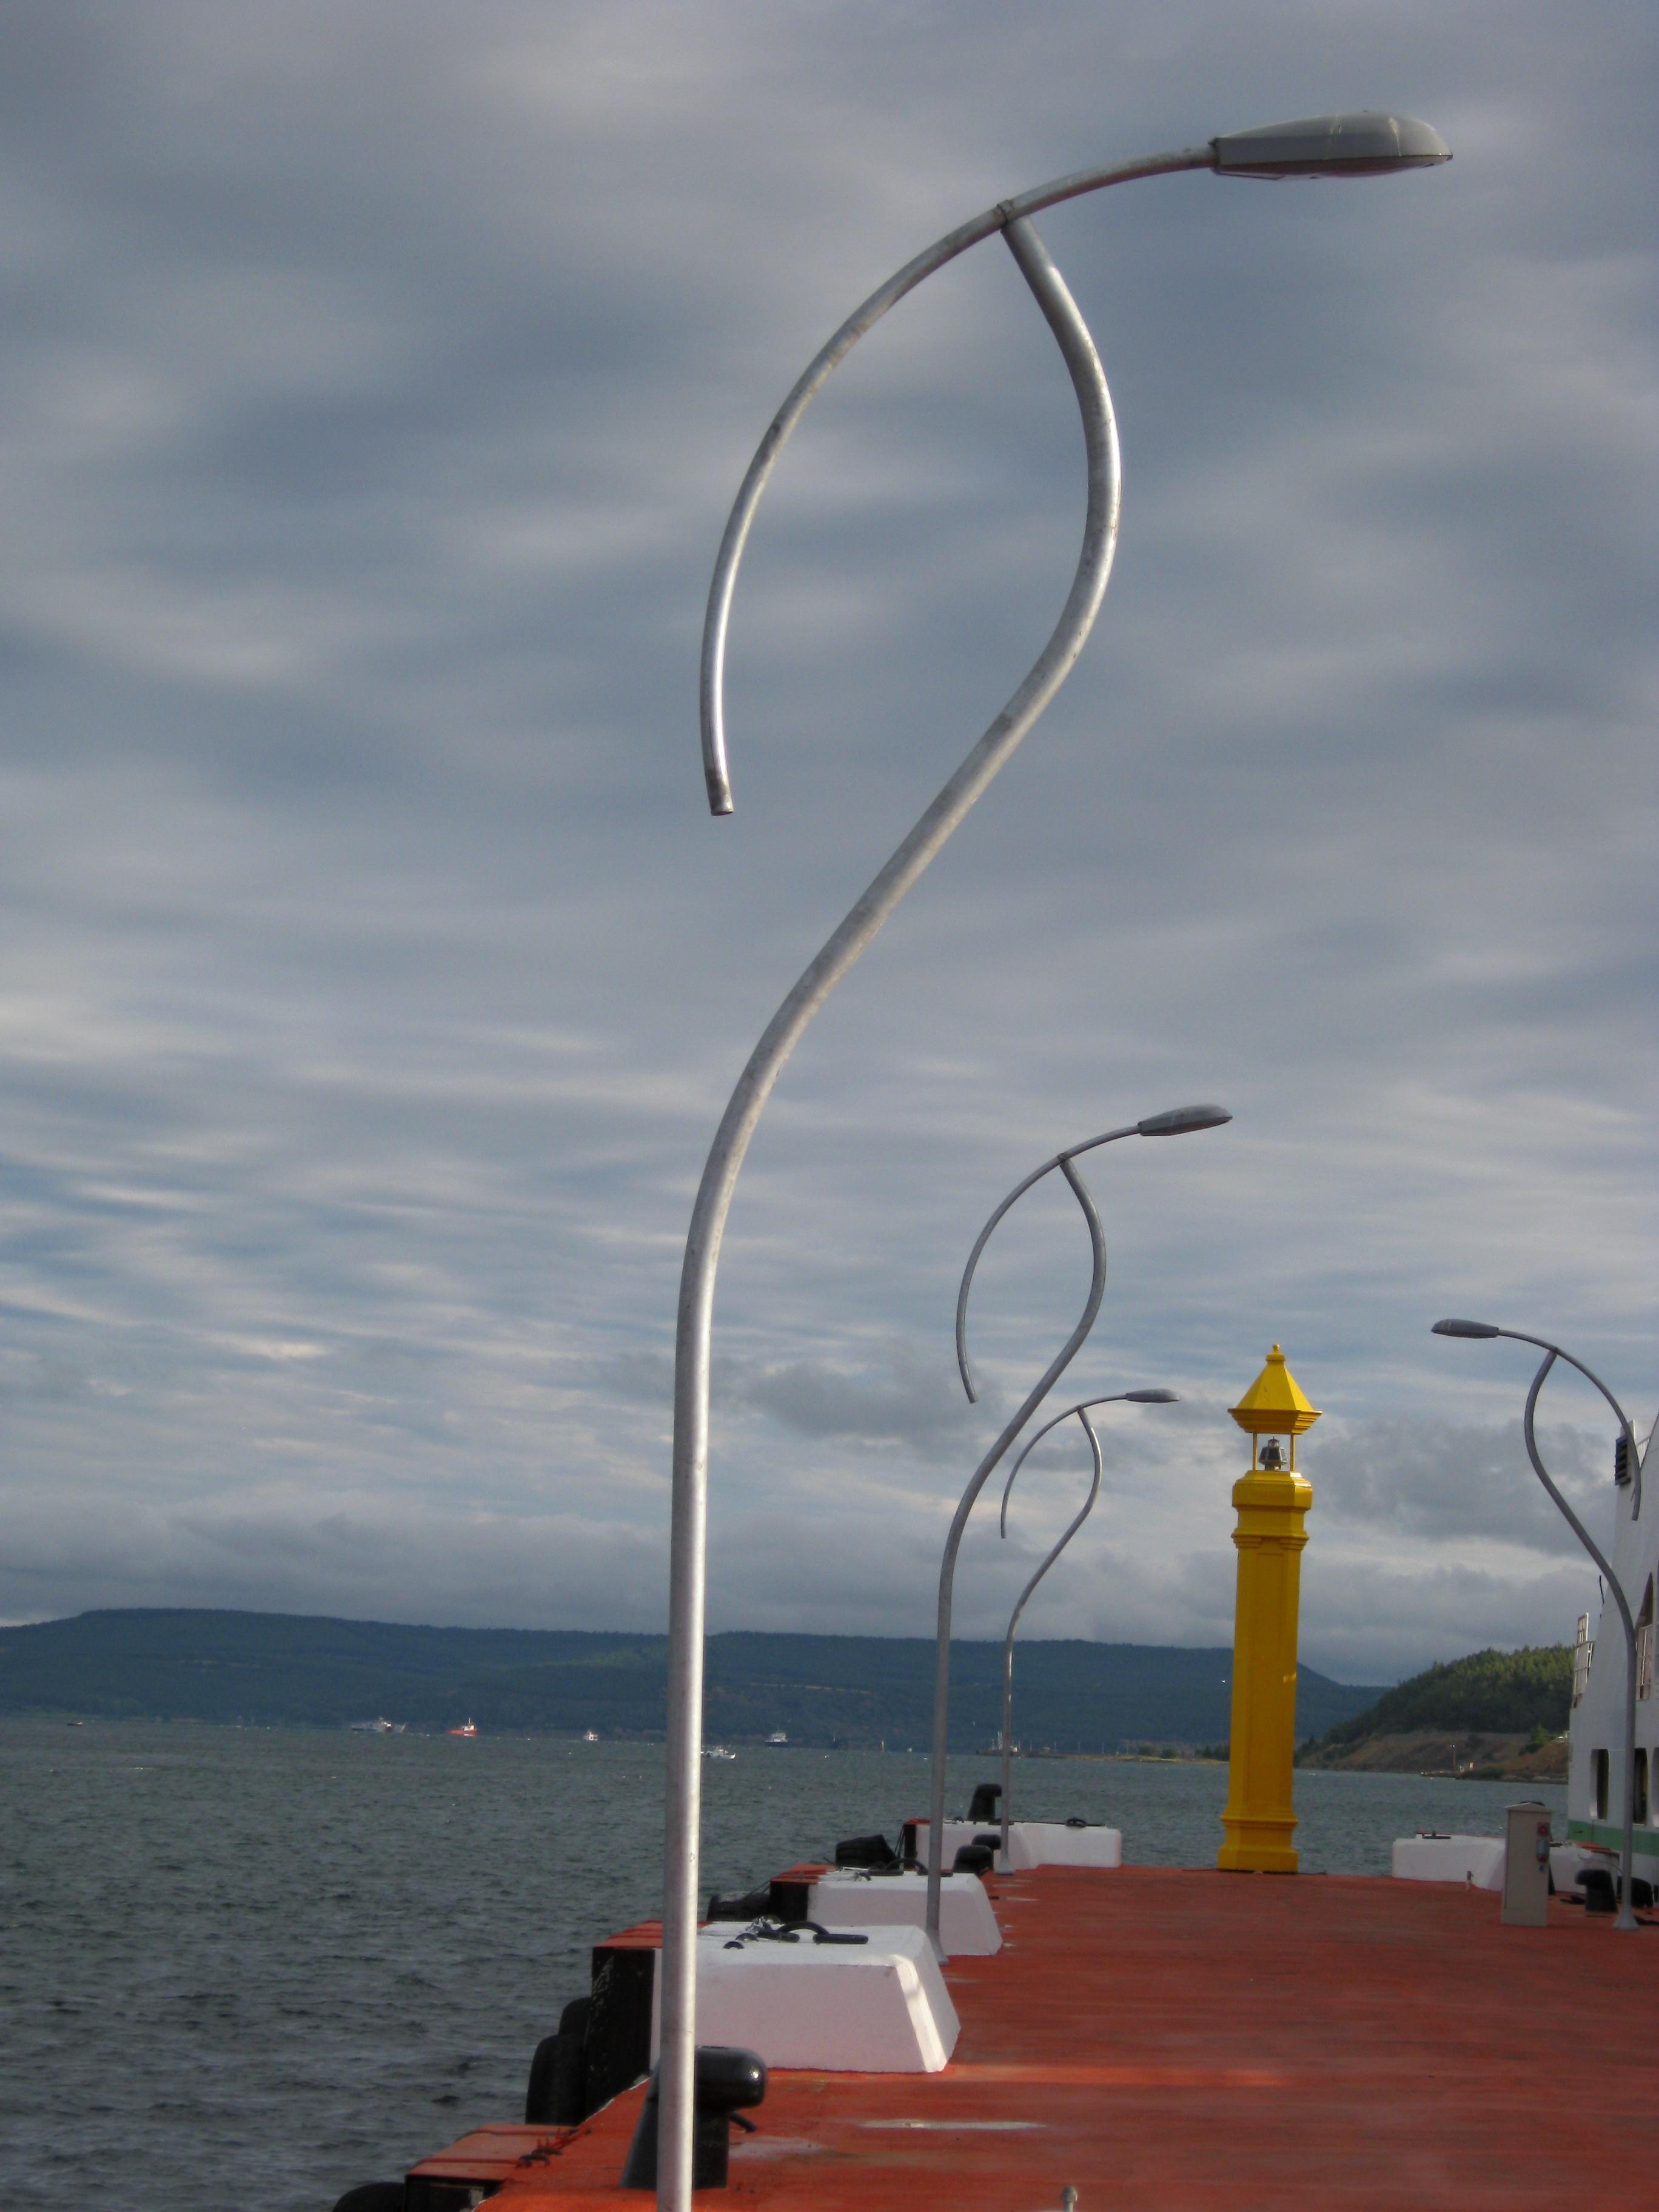 Pier Ligthhouse, Boat, Fishing, Light, Lighthouse, HQ Photo